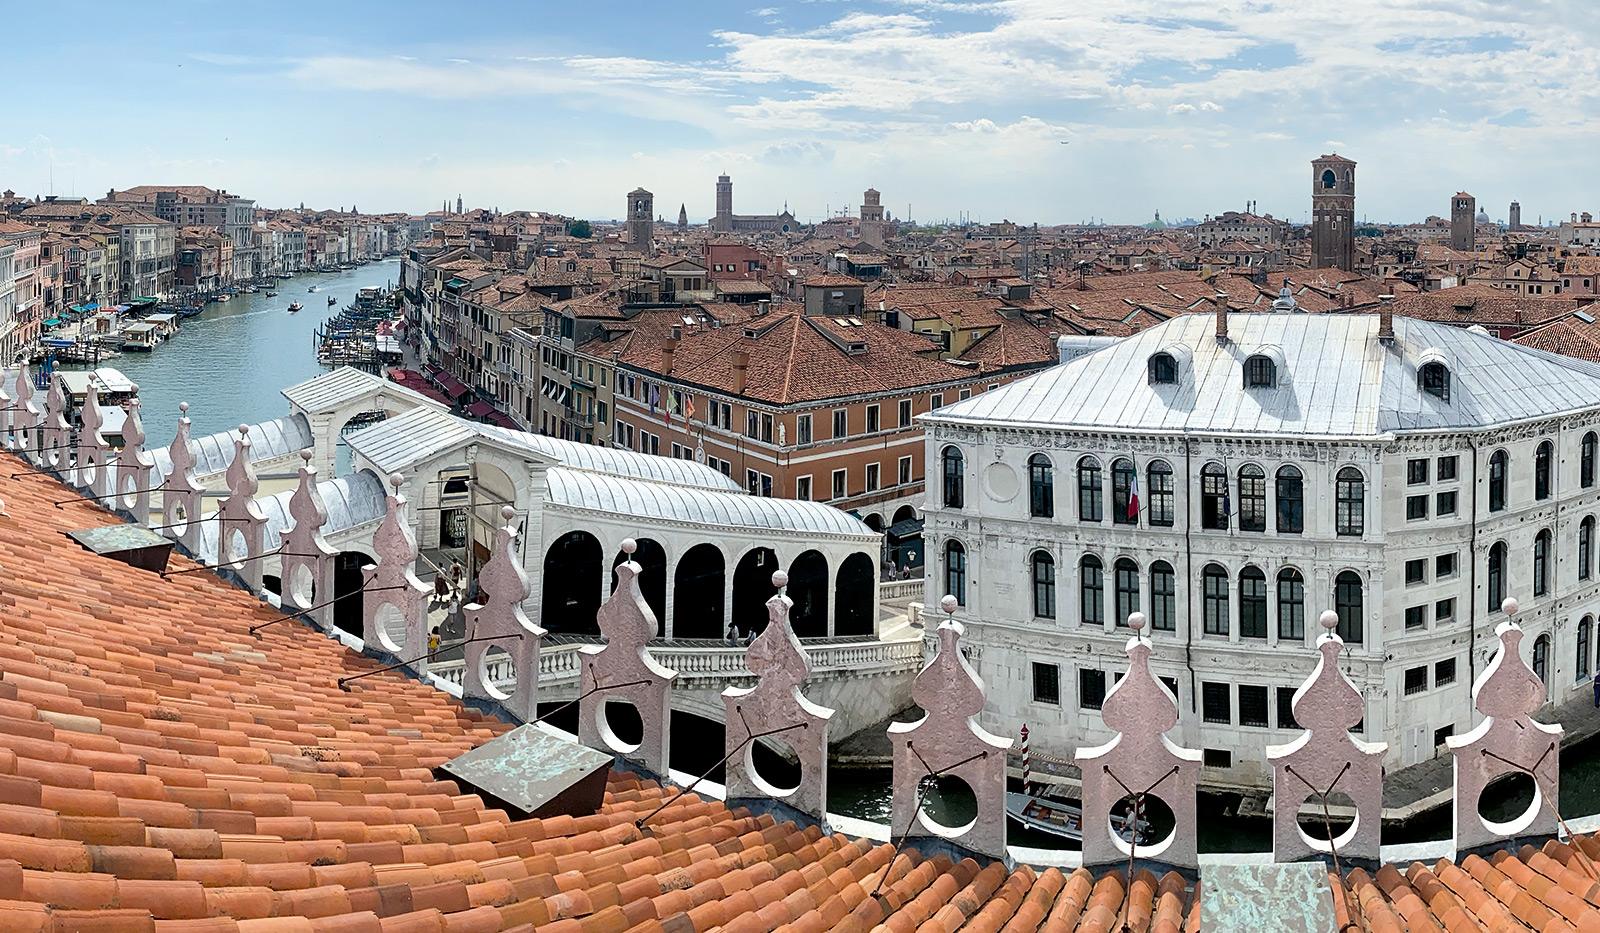 venedig panorama - Venedig – La Serenissima